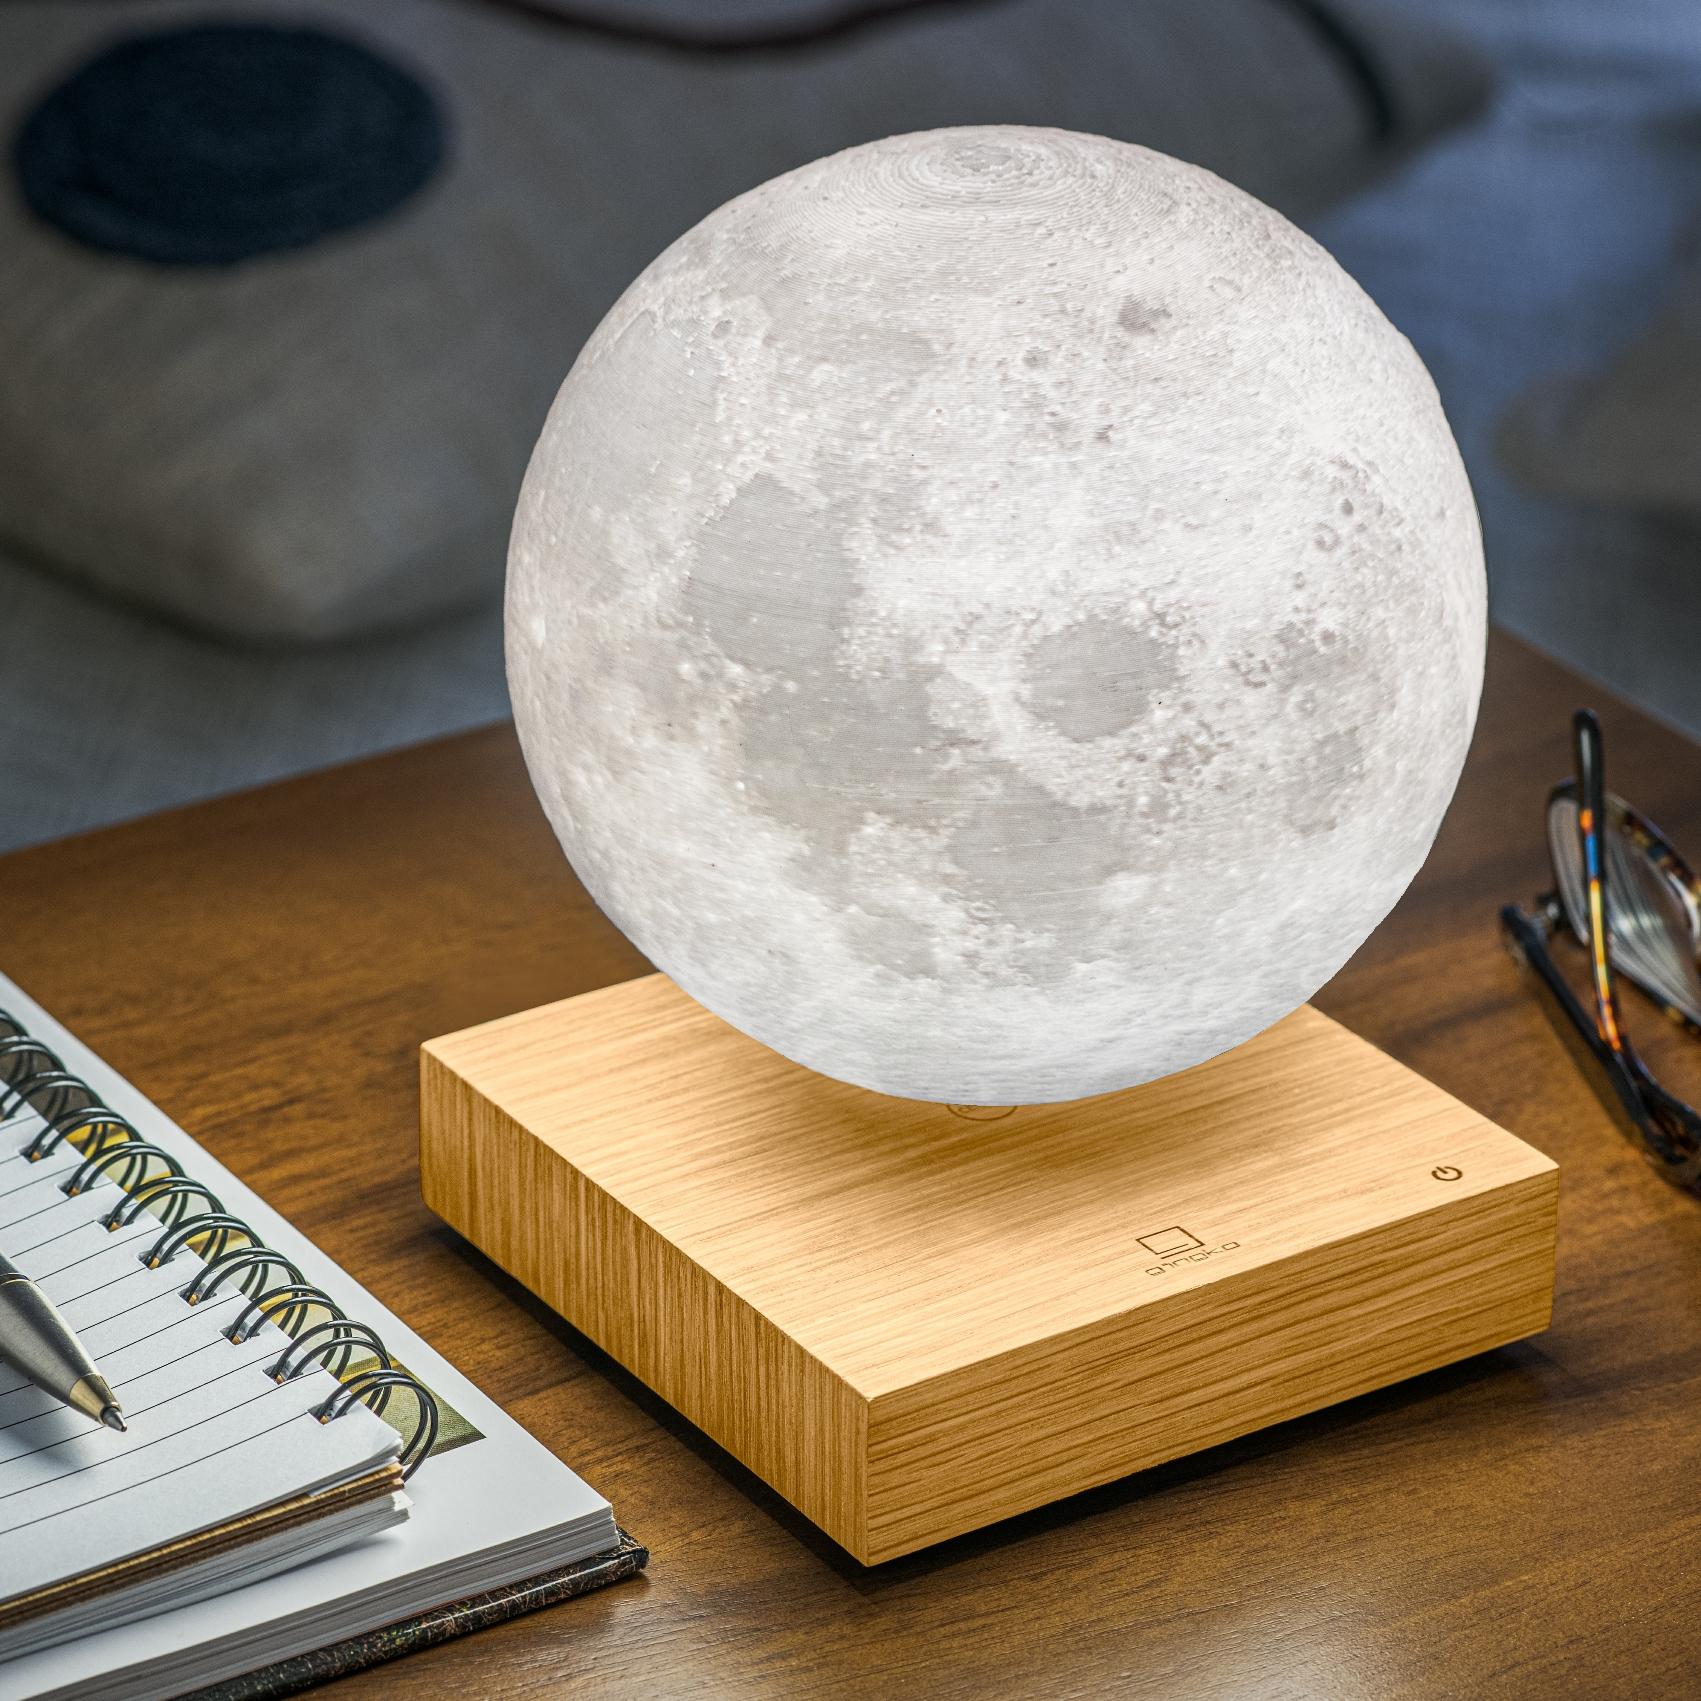 Gingko smart moon lamp05